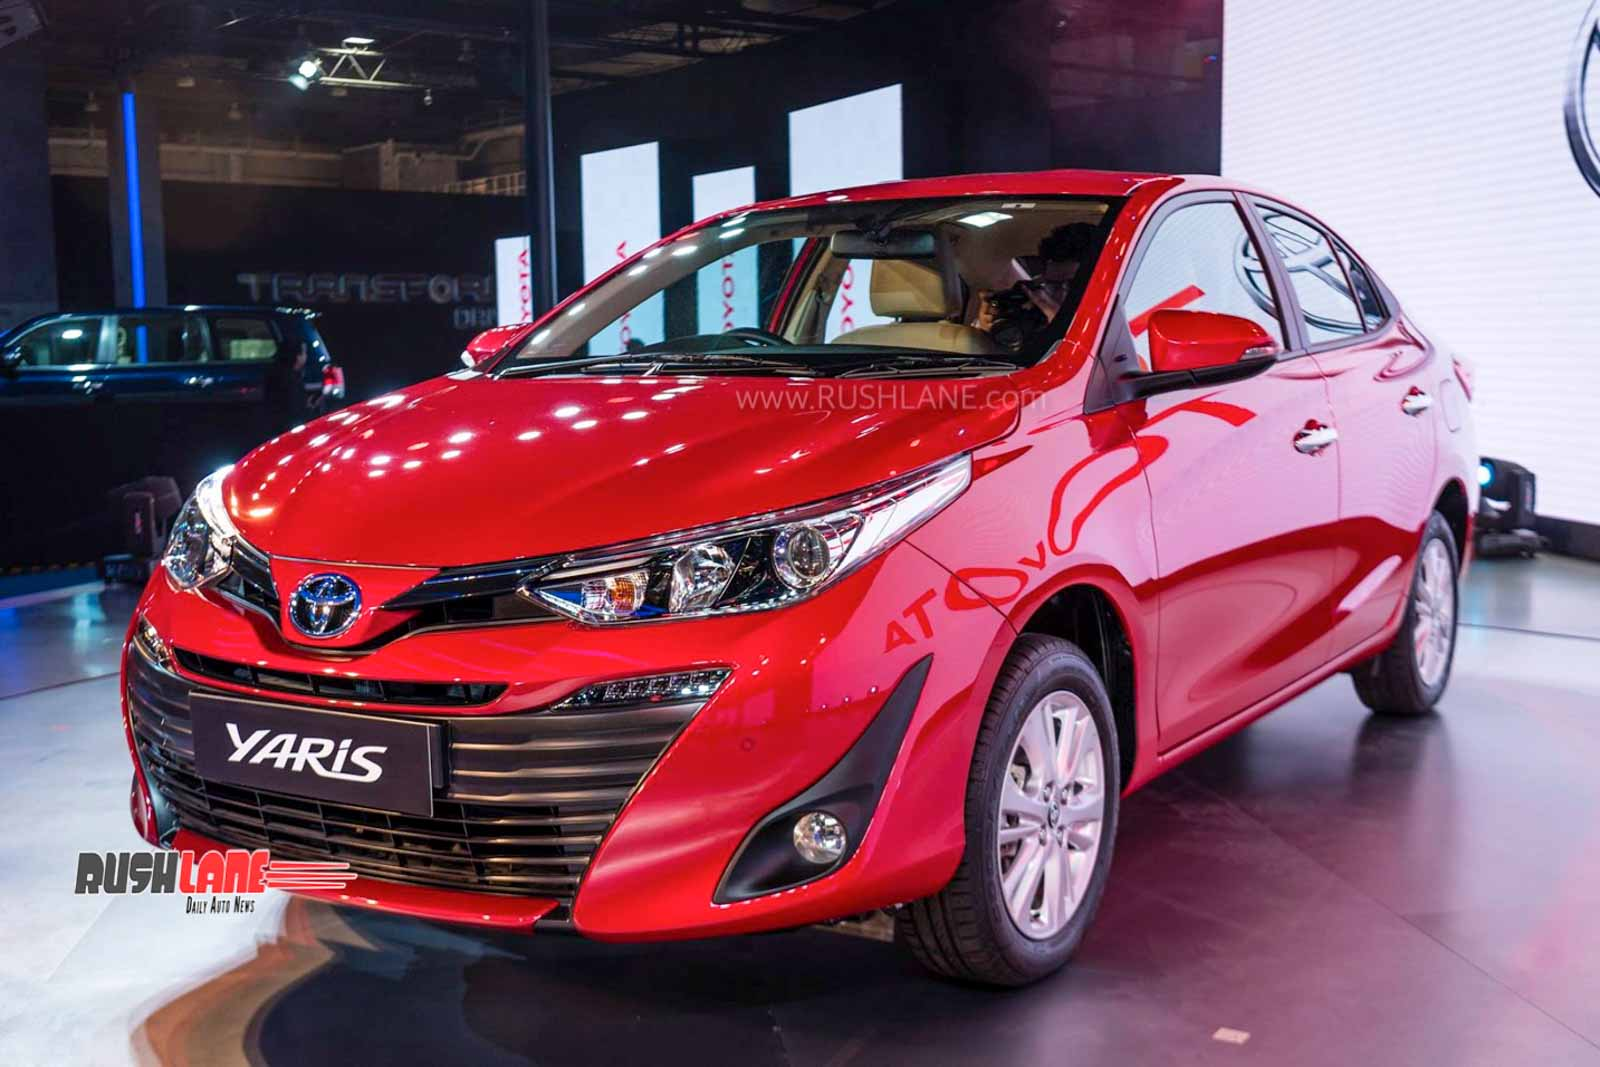 Toyota Yaris BS6 petrol